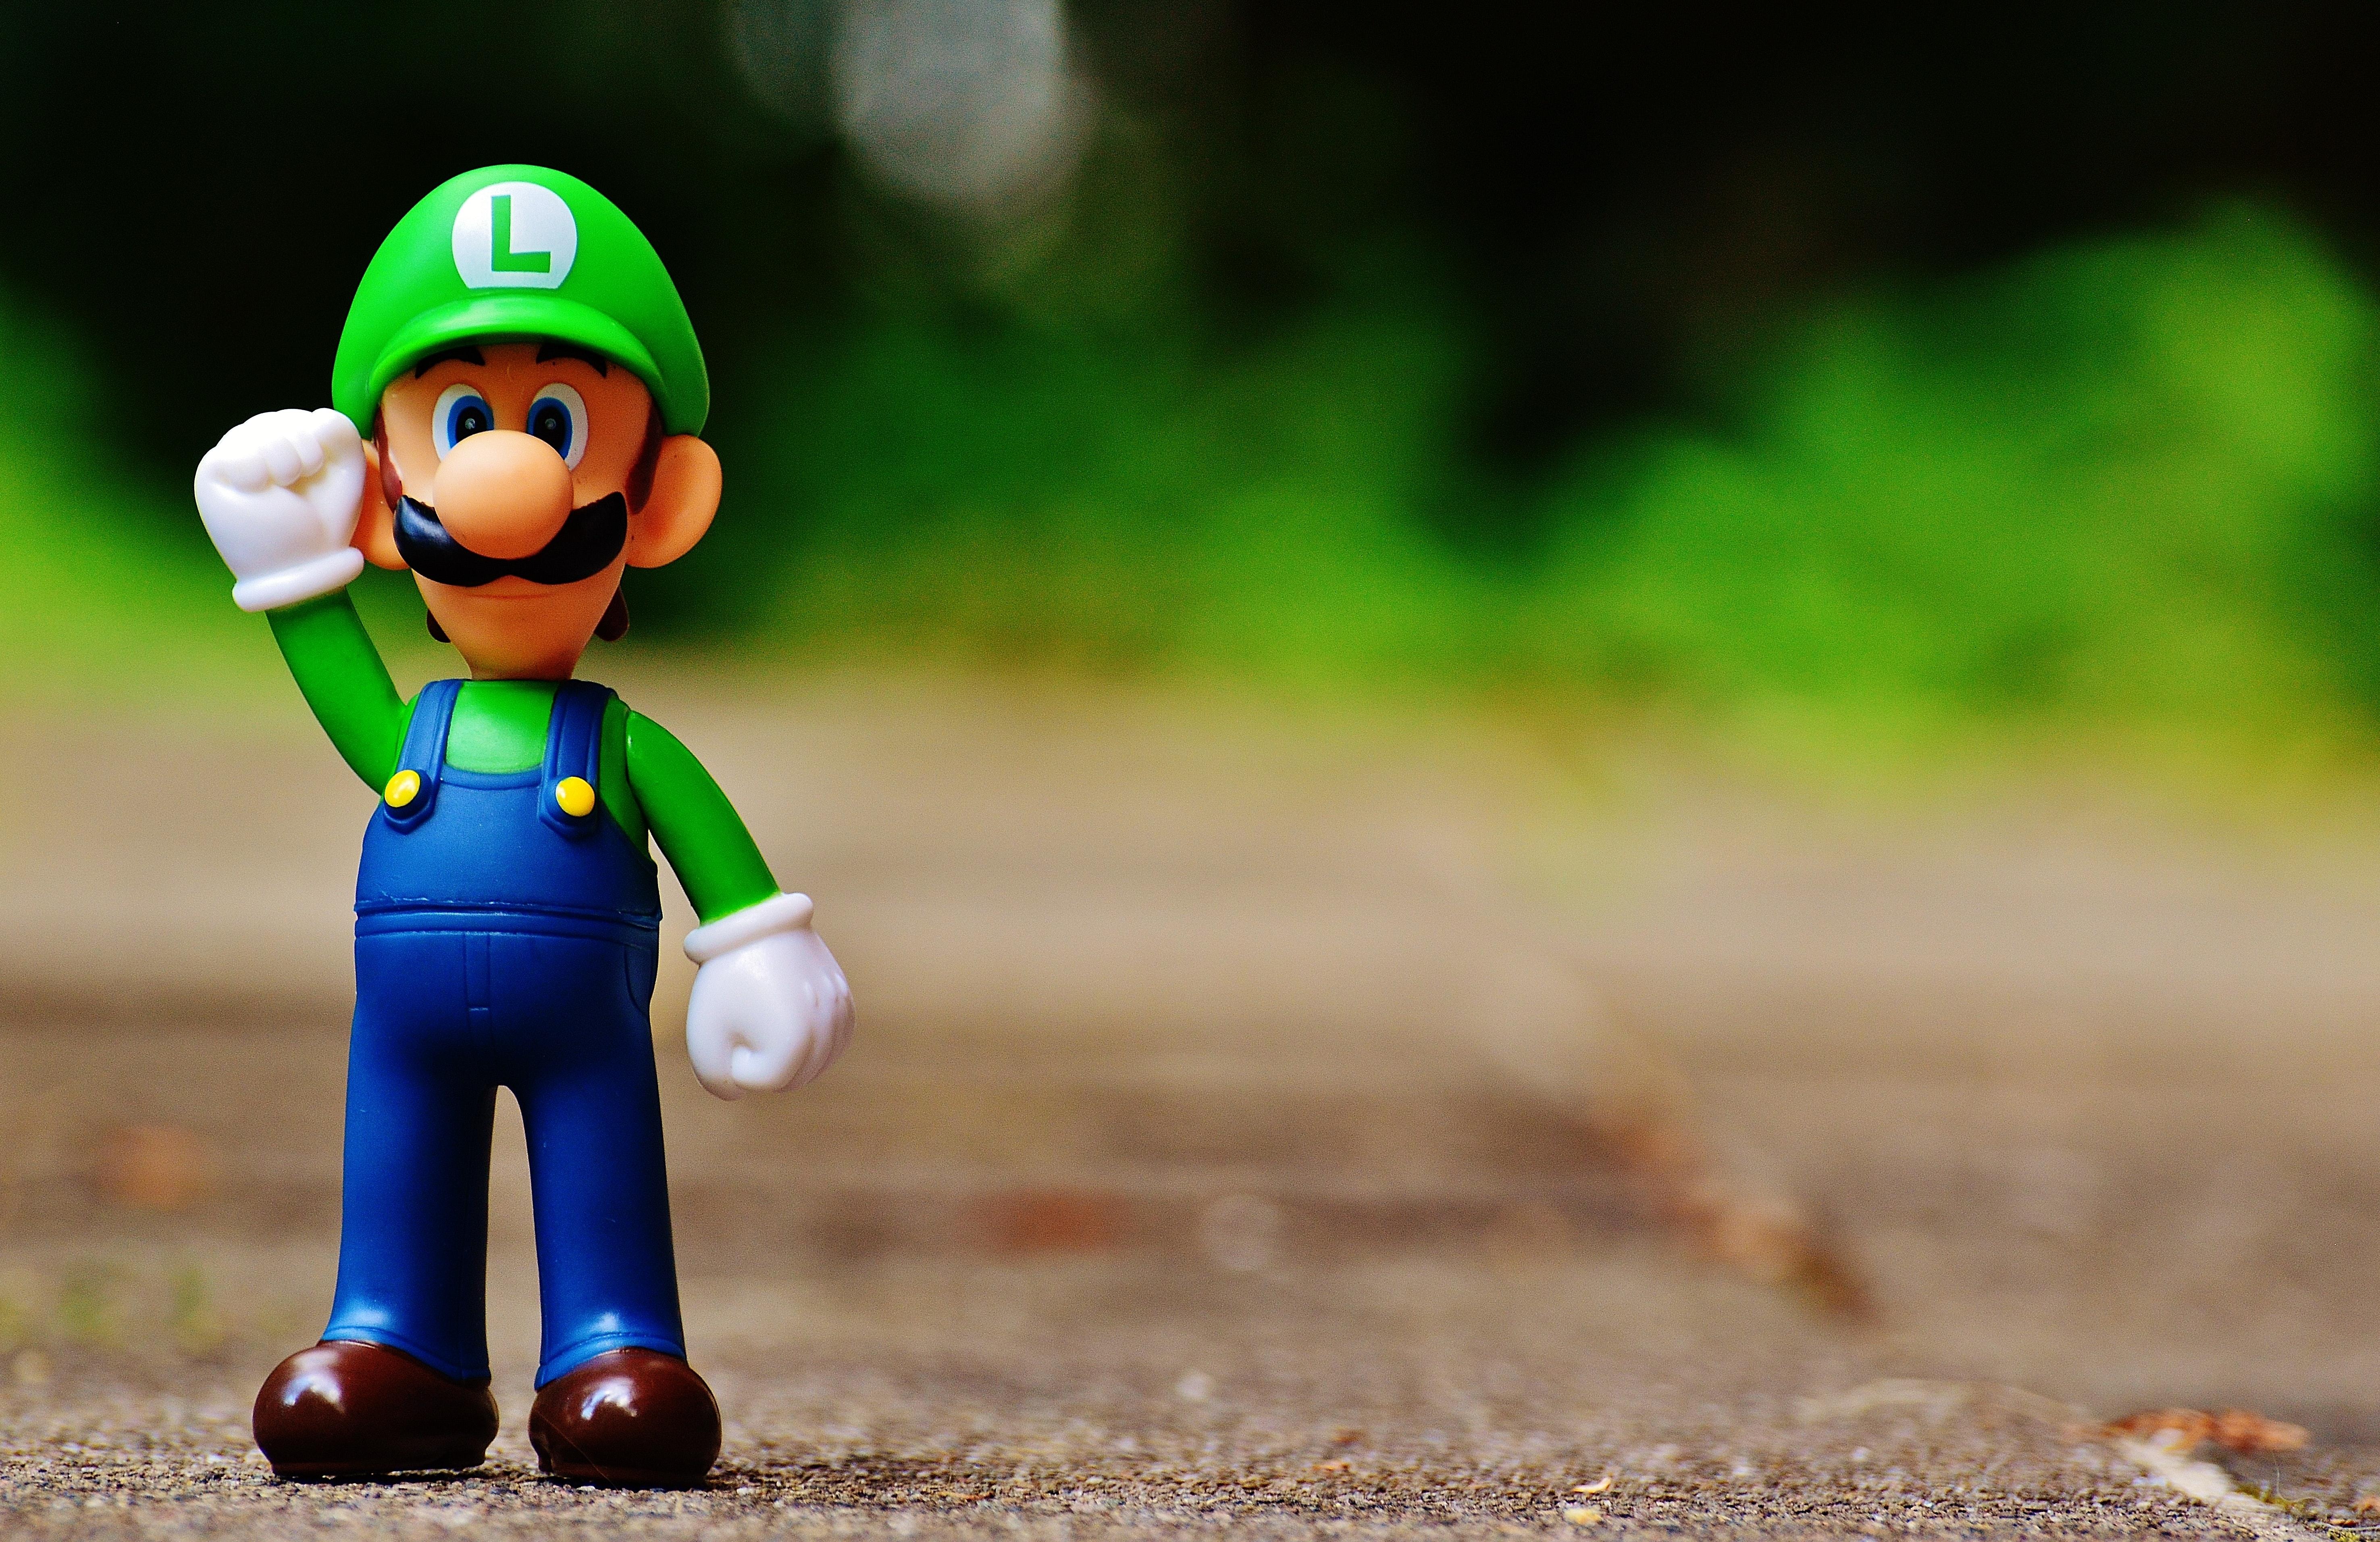 Shallow Focus Photography of Luigi Plastic Figure, Blur, Kid, Toy, Super Mario, HQ Photo